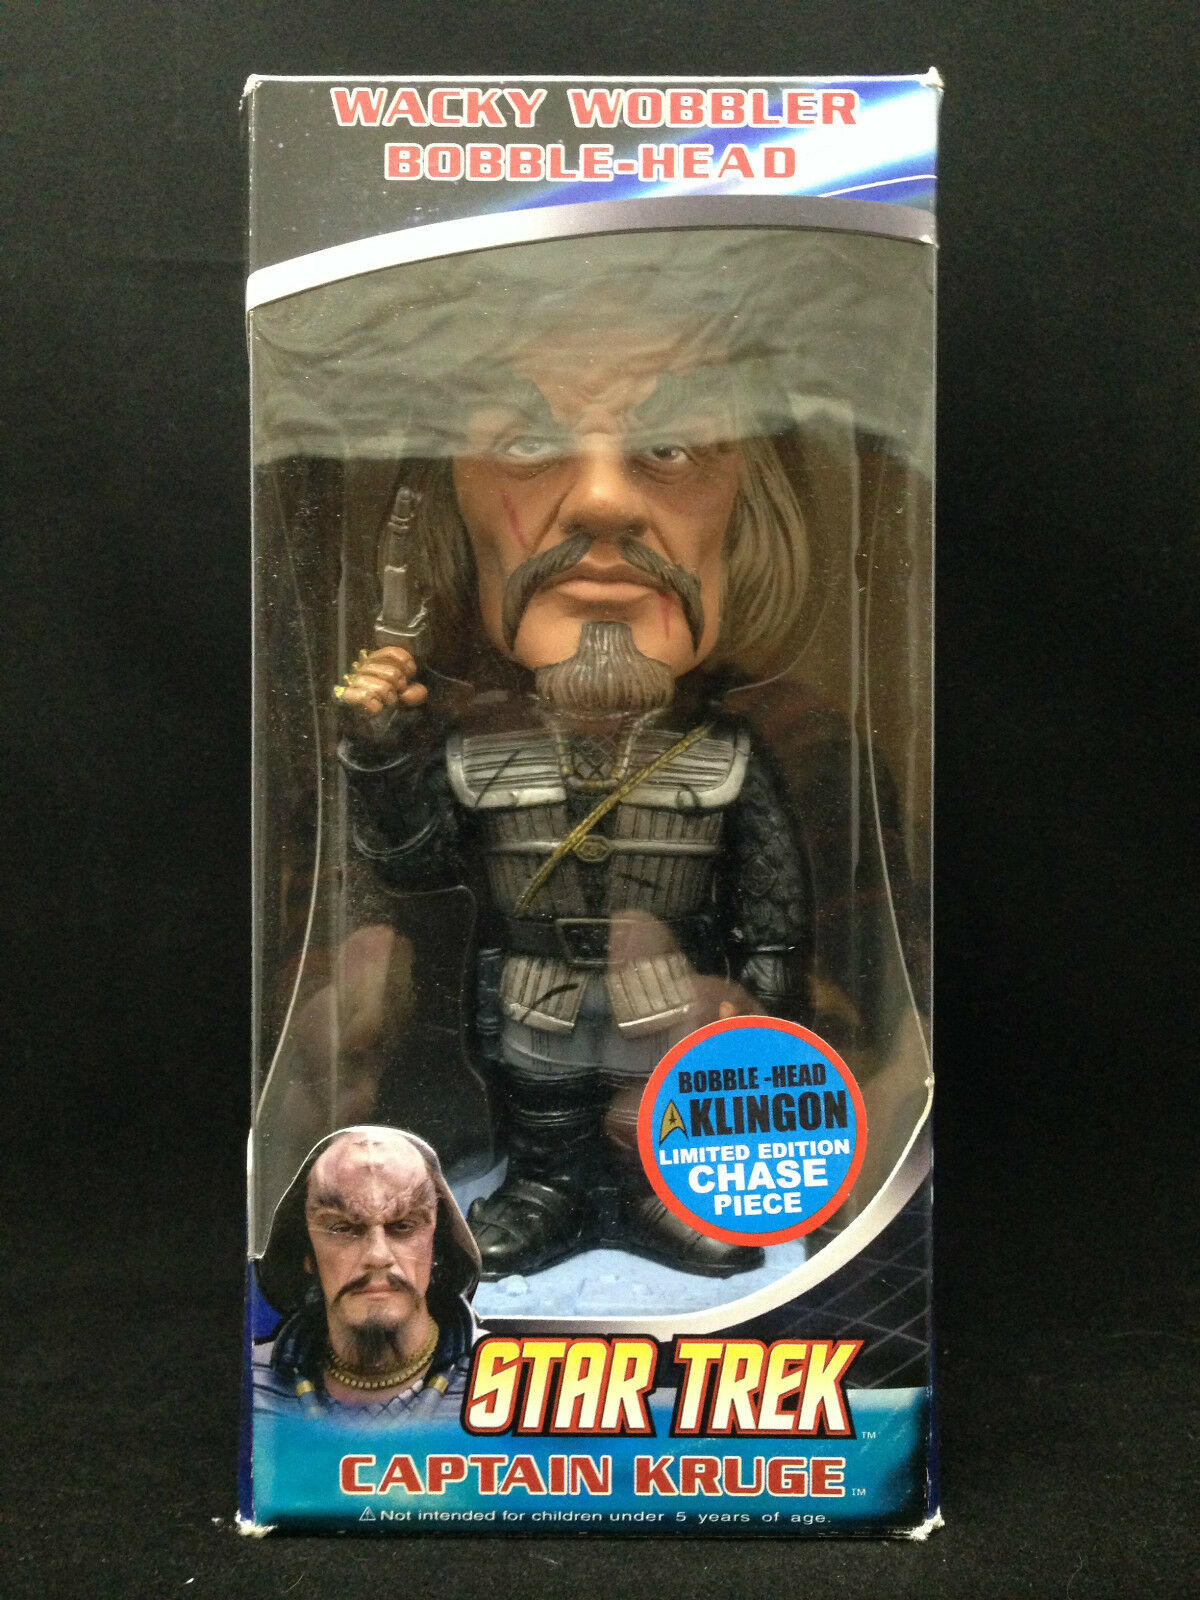 FUNKO capitán Kruge Klingon Chase Pieza Estrella Trek WACKY WOBBLER BOBBLE HEAD NUEVO